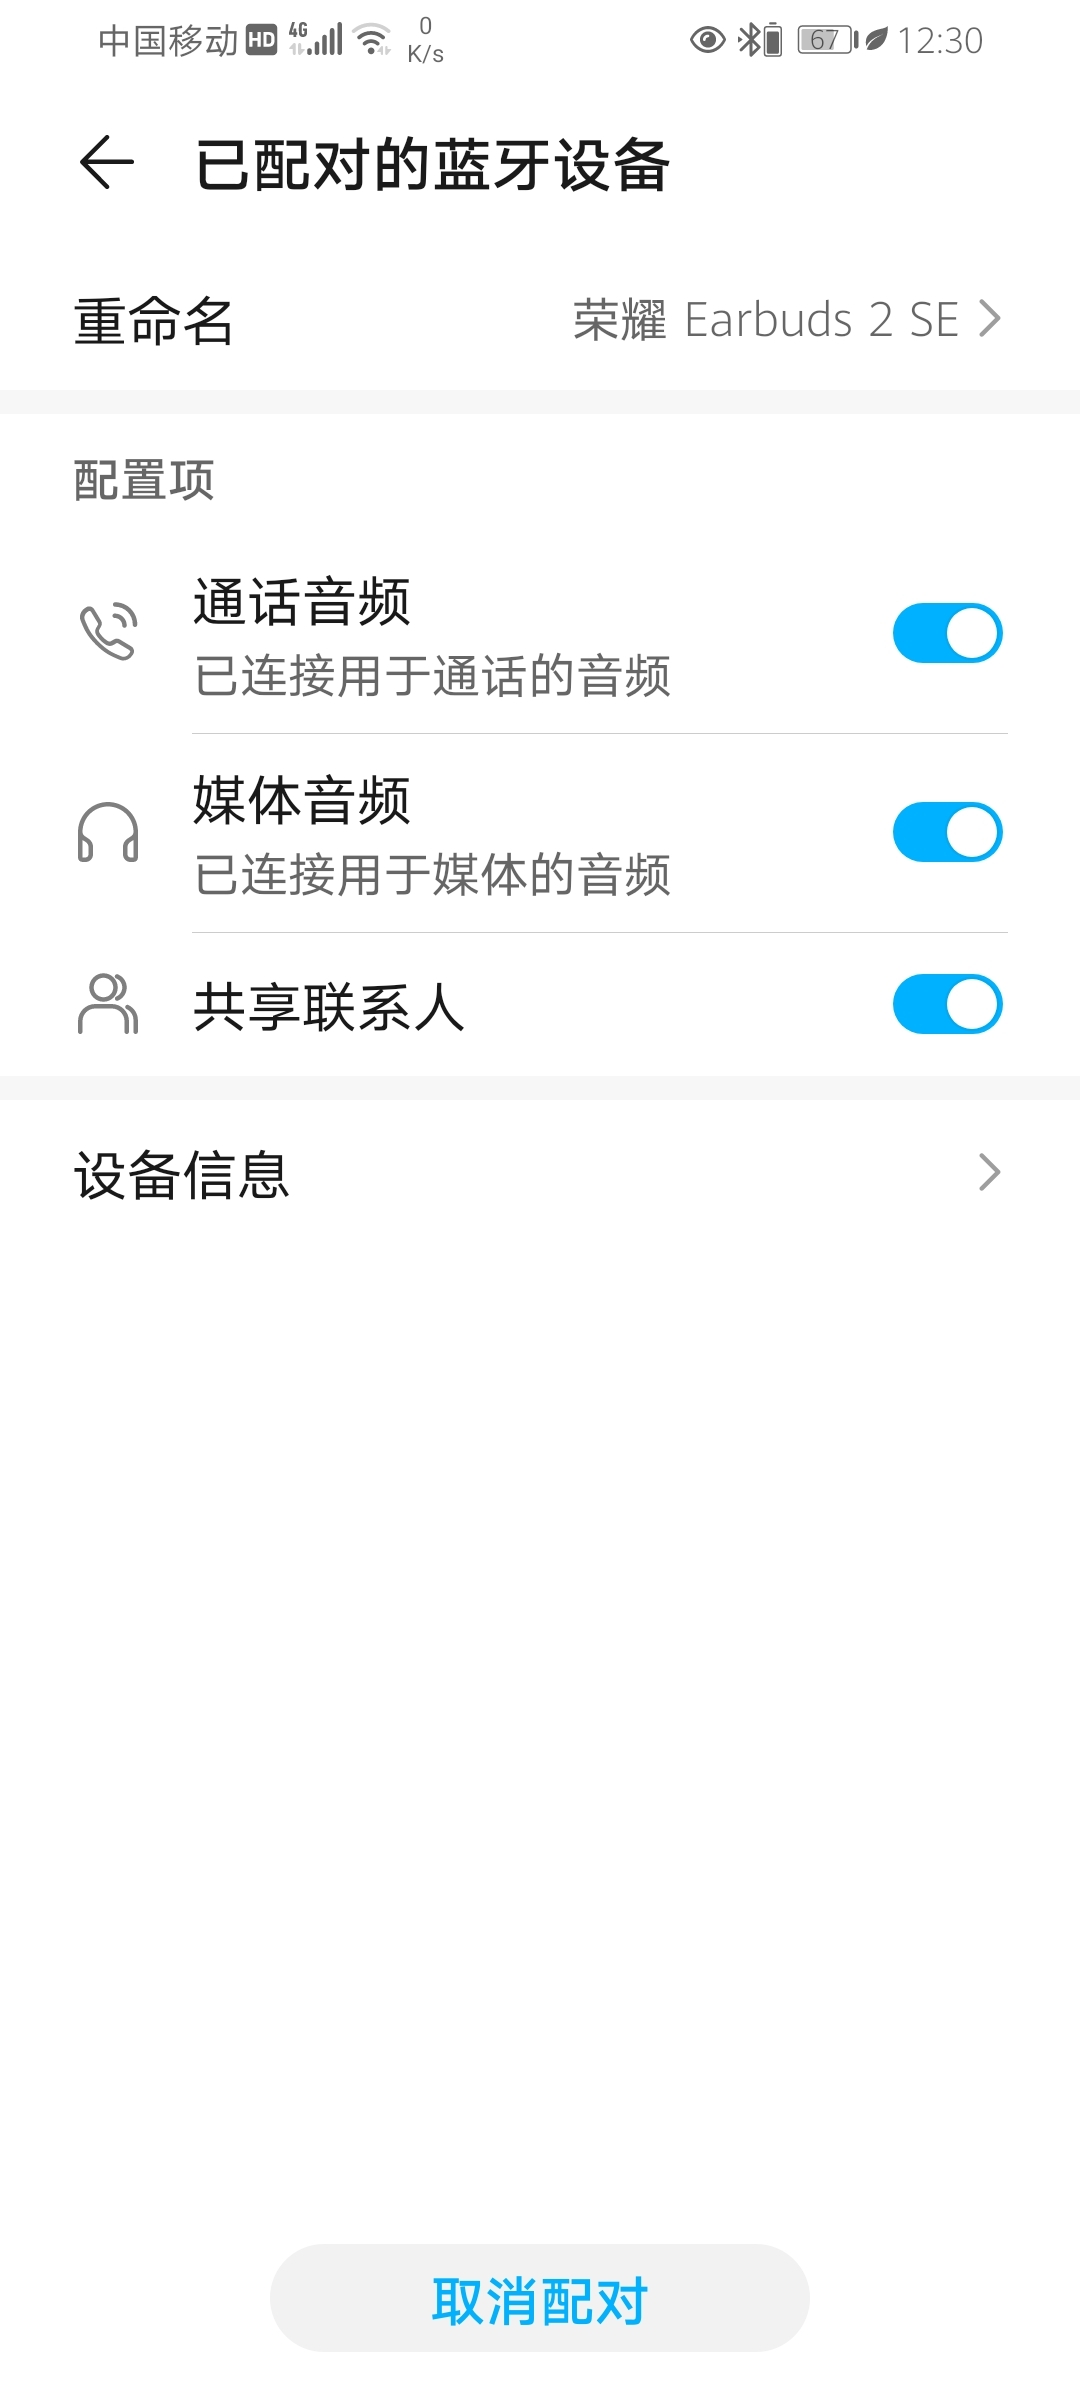 Screenshot_20210910_003013_com.android.settings.jpg